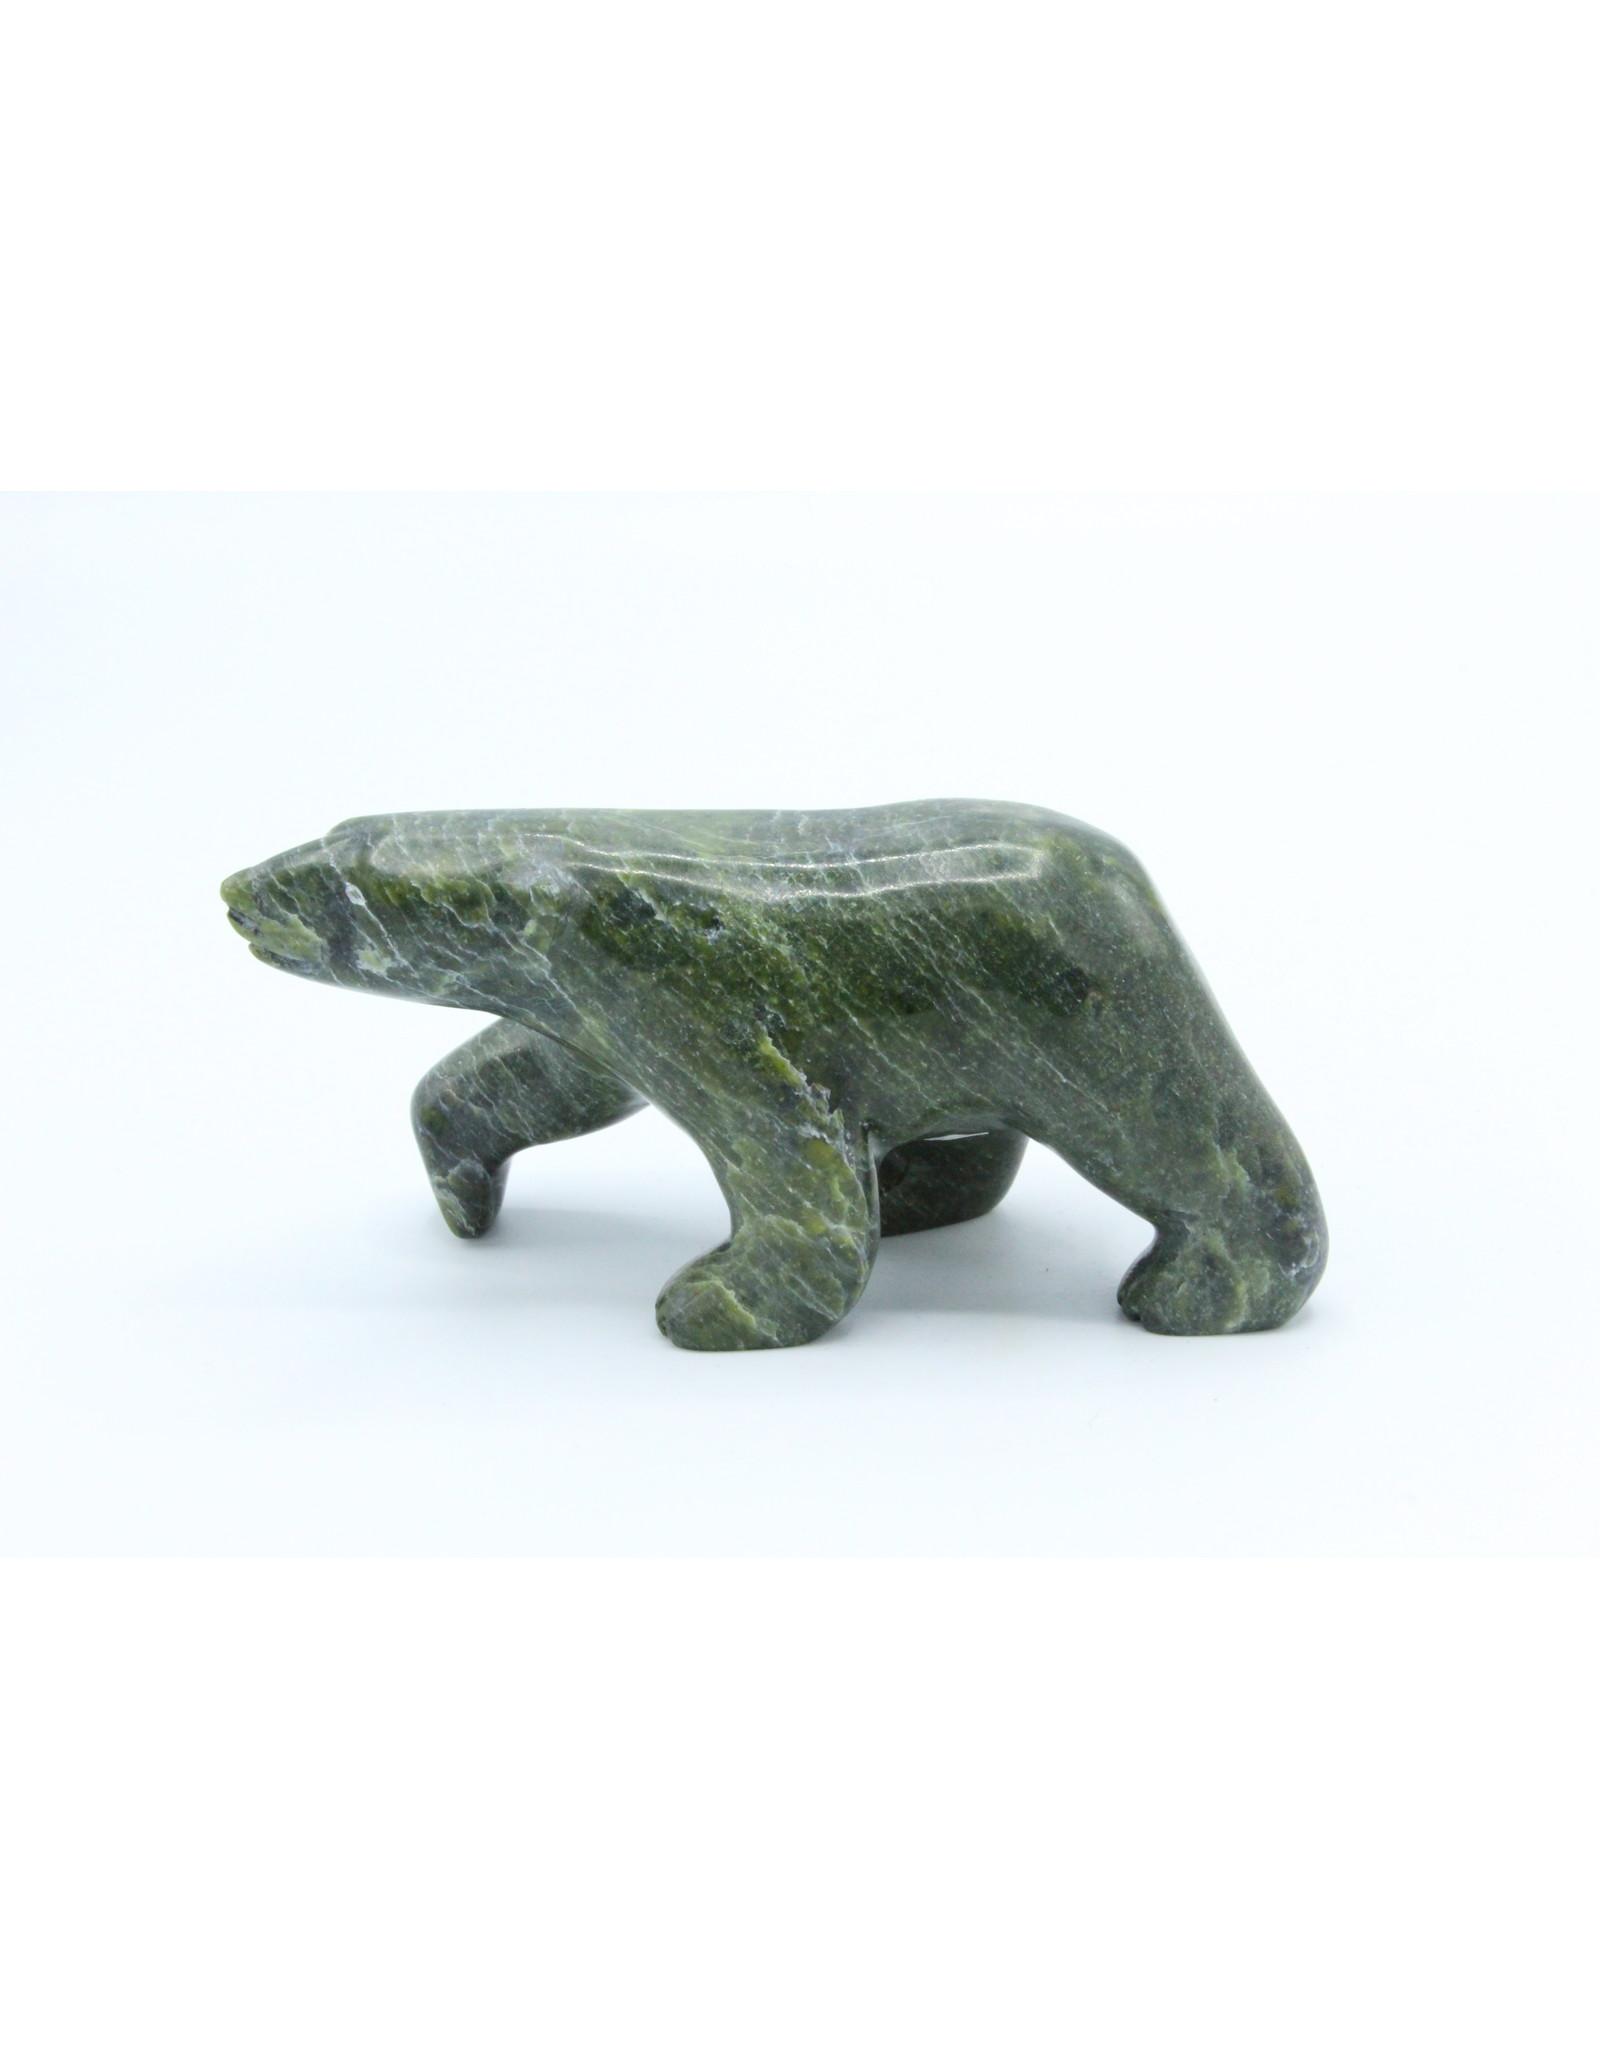 63164 Bear by Allan Shutiapik